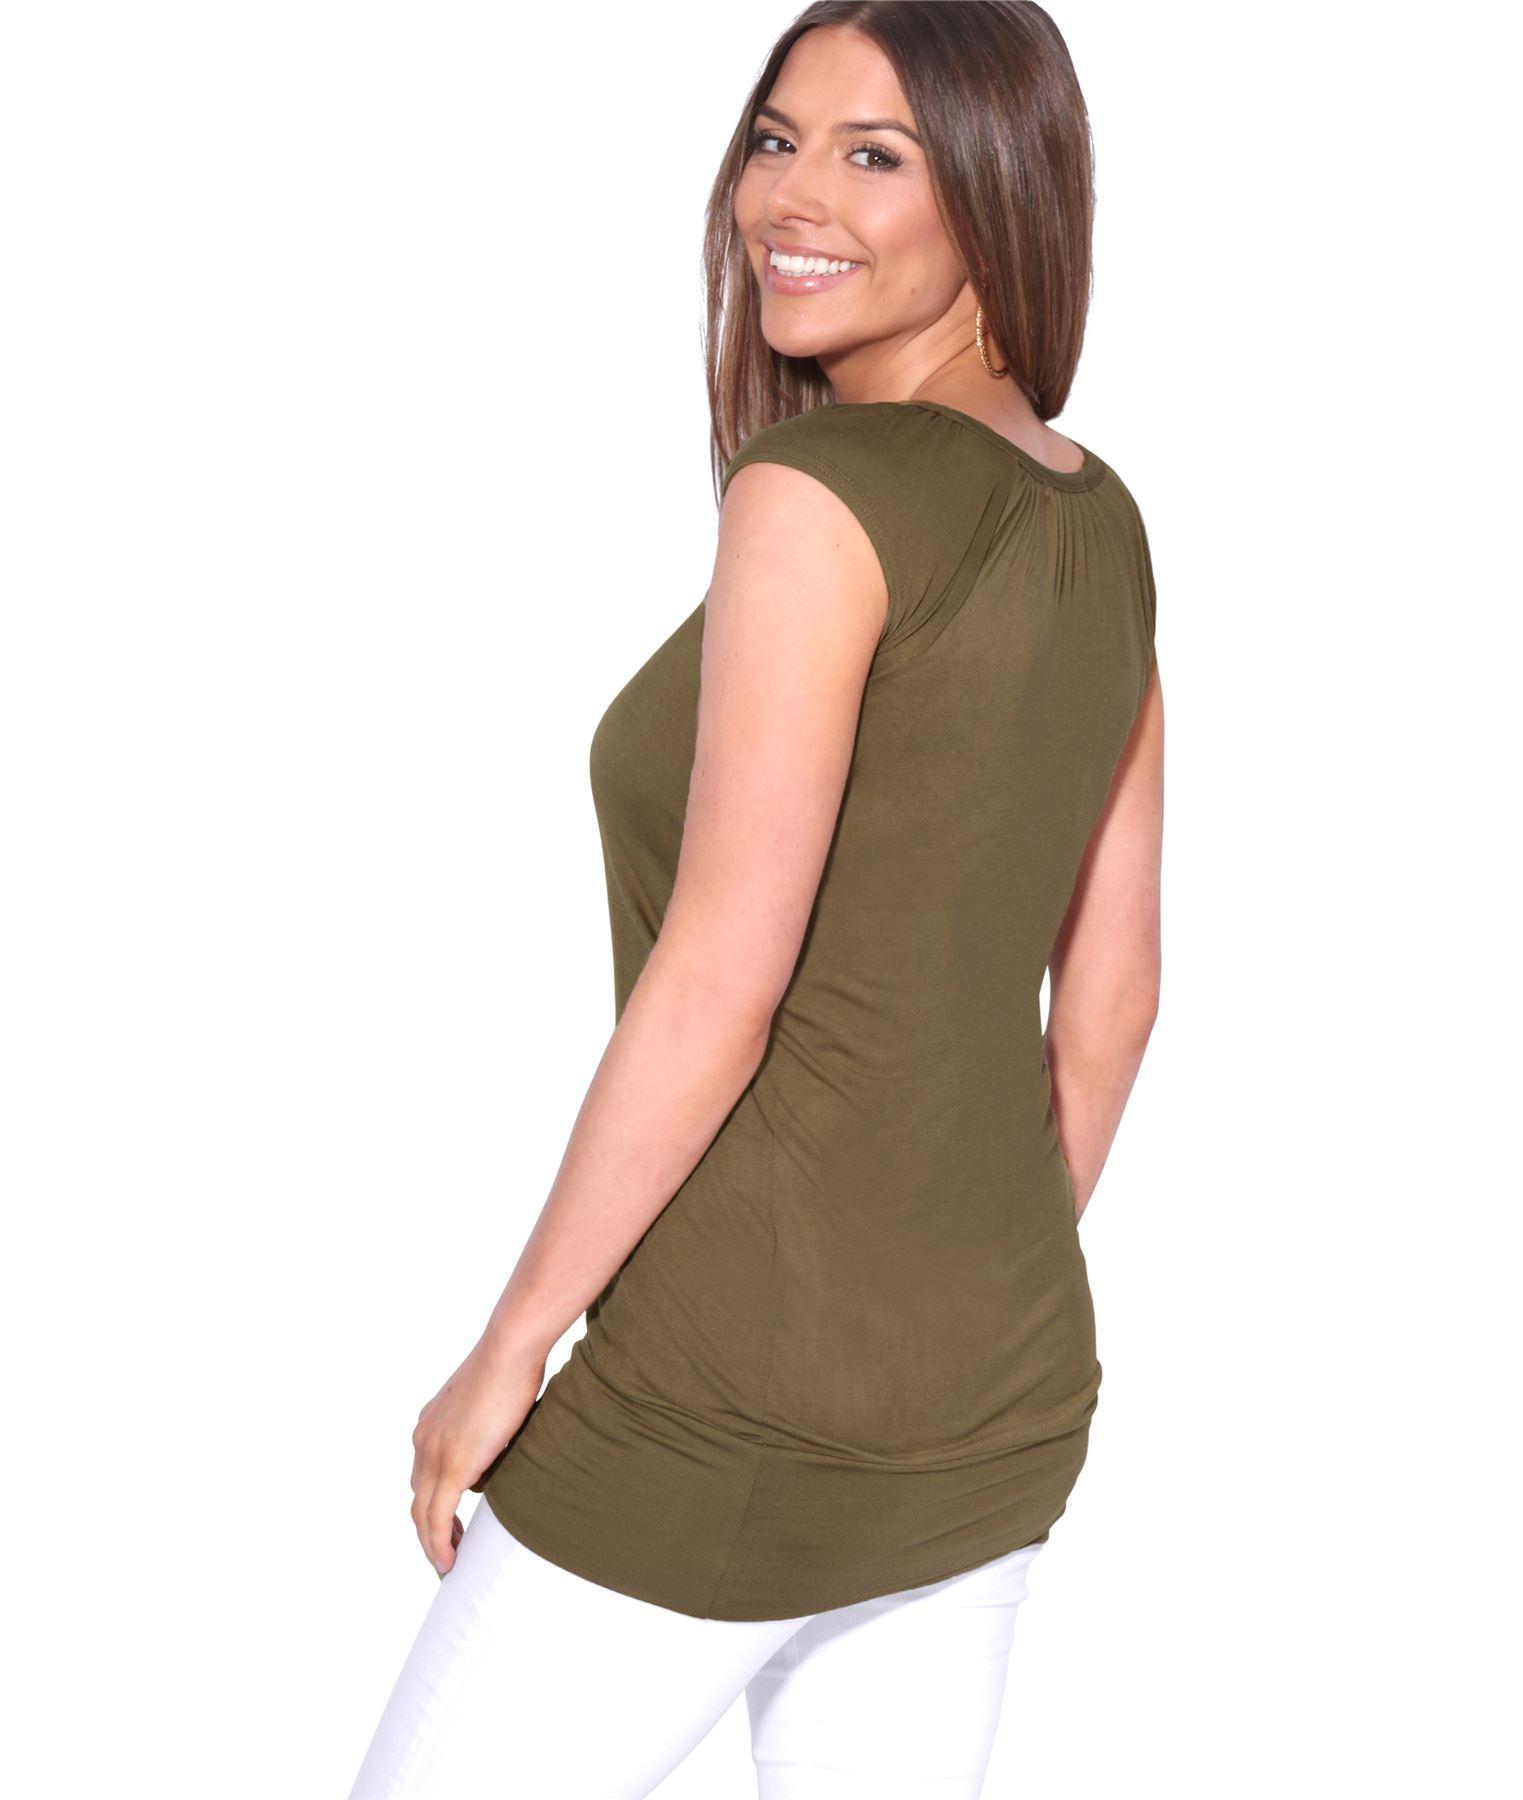 Womens-Ladies-Plain-T-Shirt-Short-Sleeve-Long-Loose-V-Neck-Blouse-Tunic-Top thumbnail 24